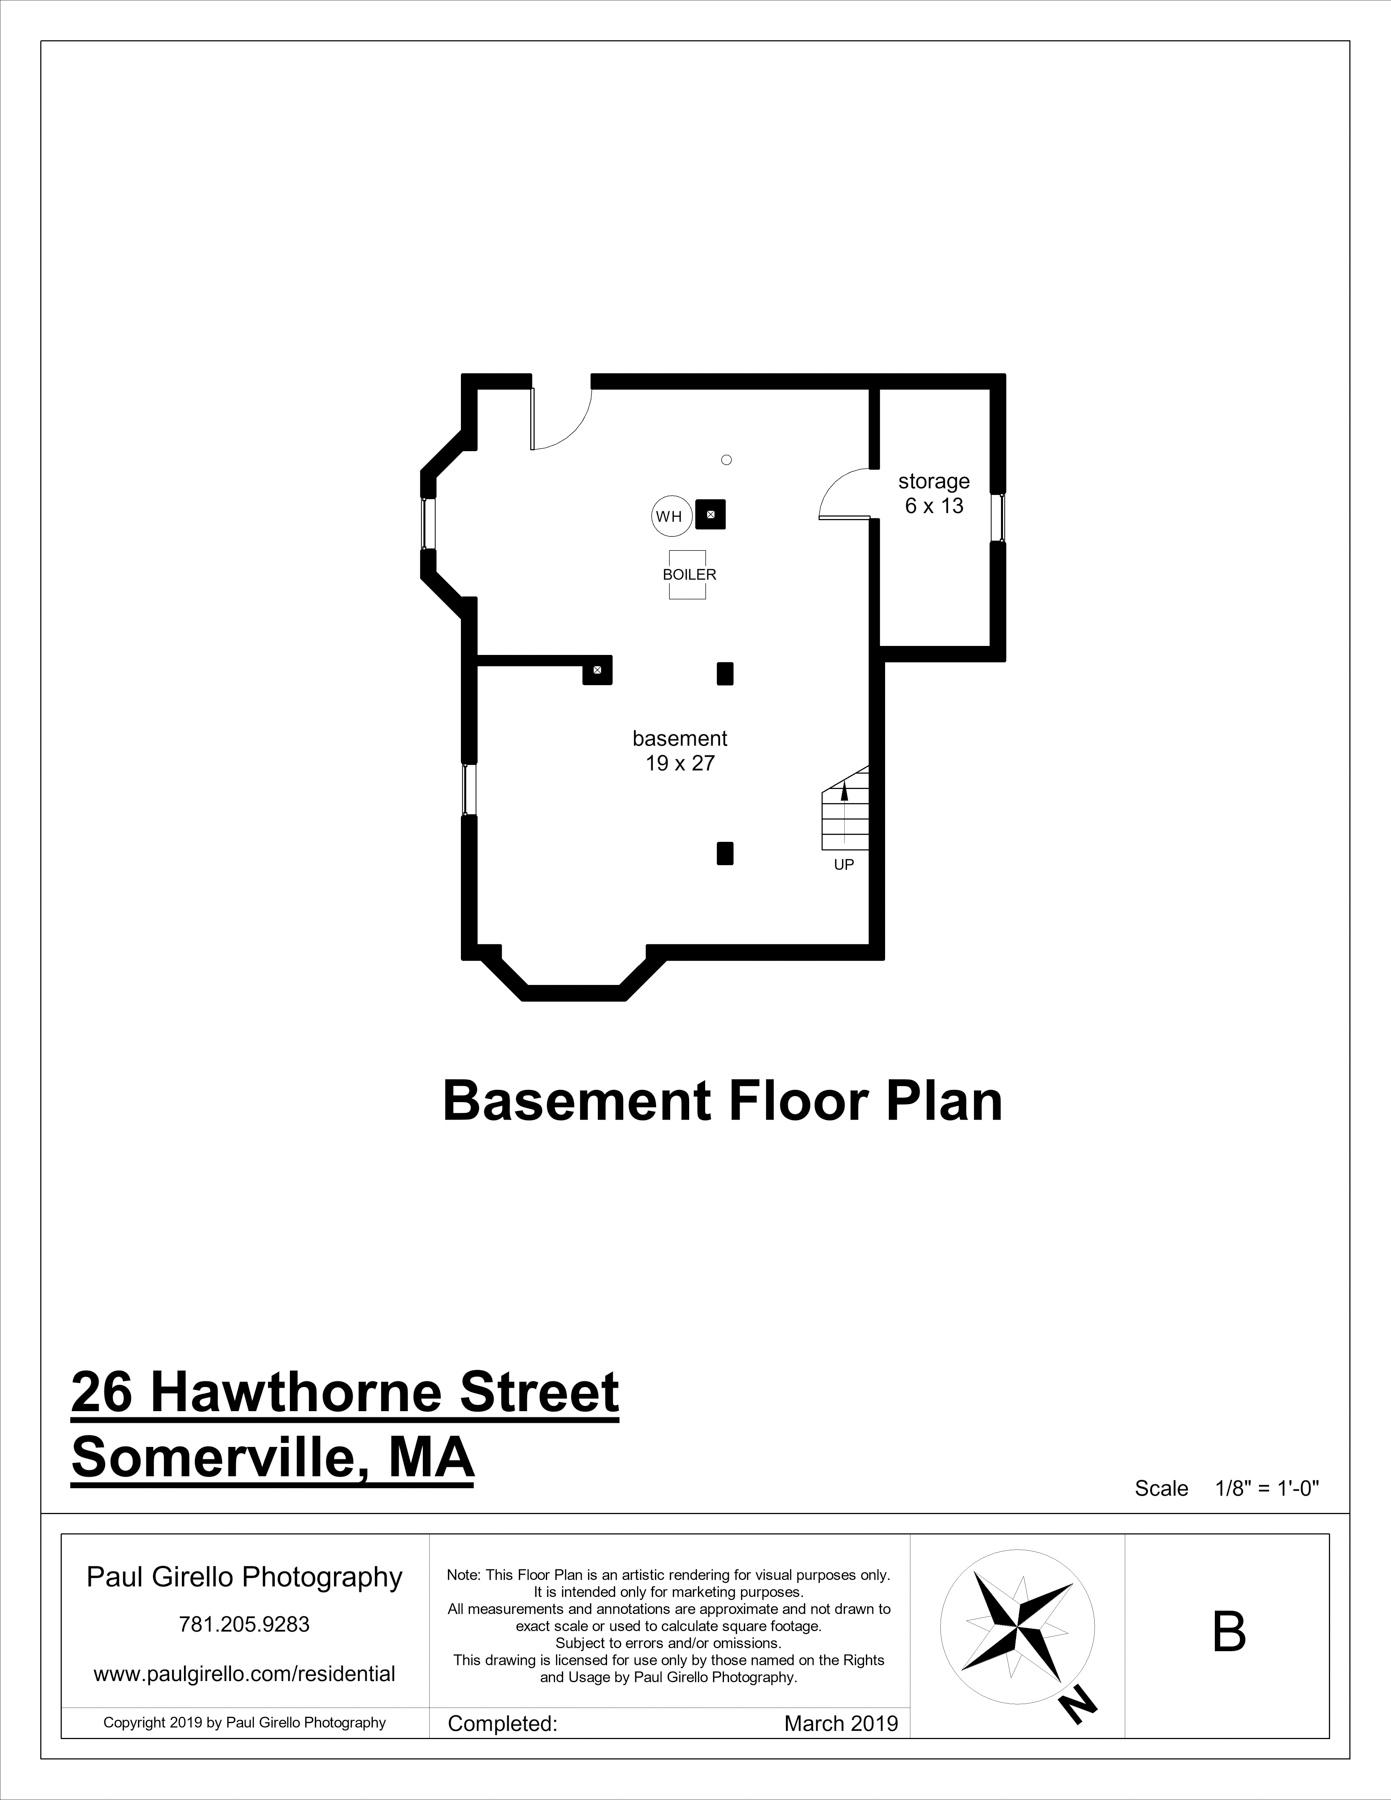 Basement Floor plan at 26 Hawthorne St in Somerville